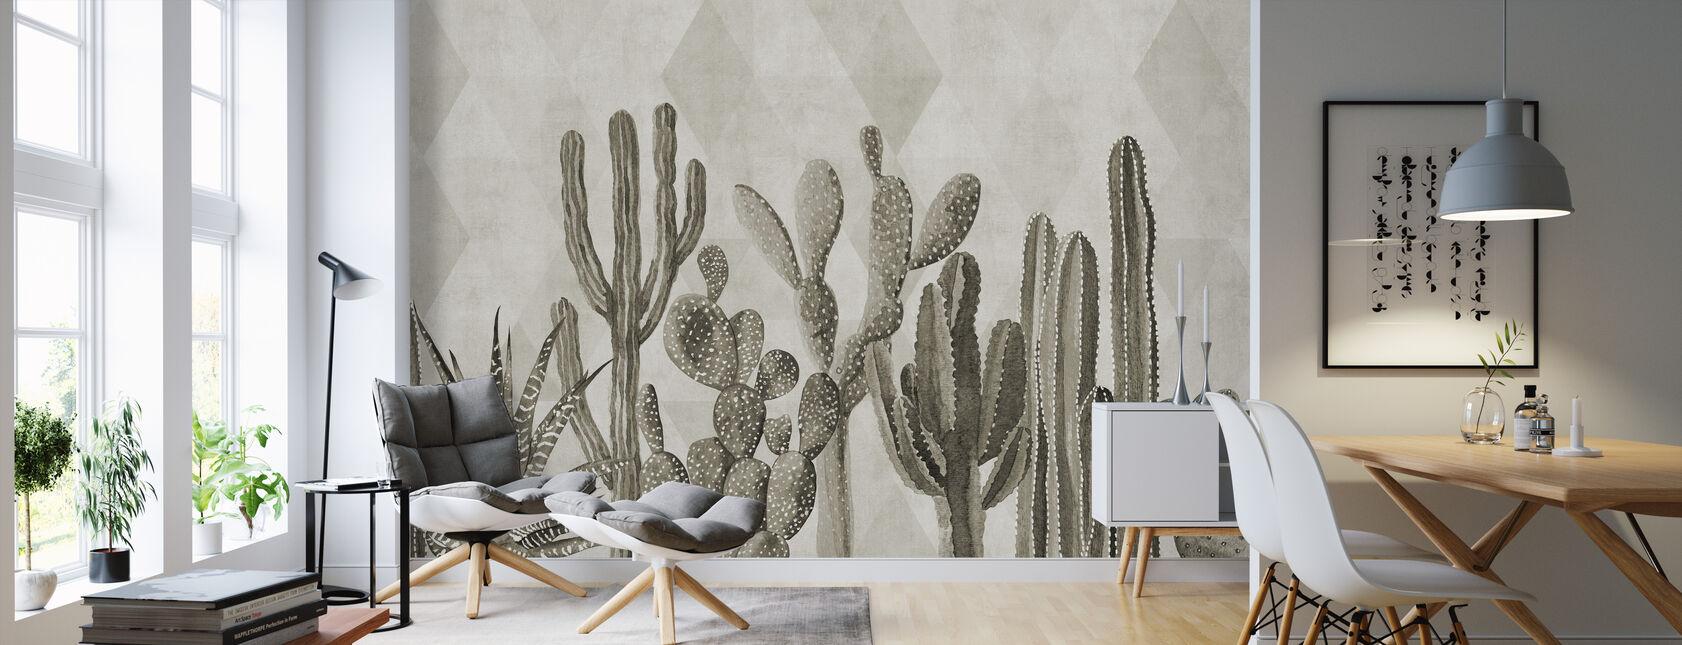 Atacama Cactus II - Sepia - Wallpaper - Living Room